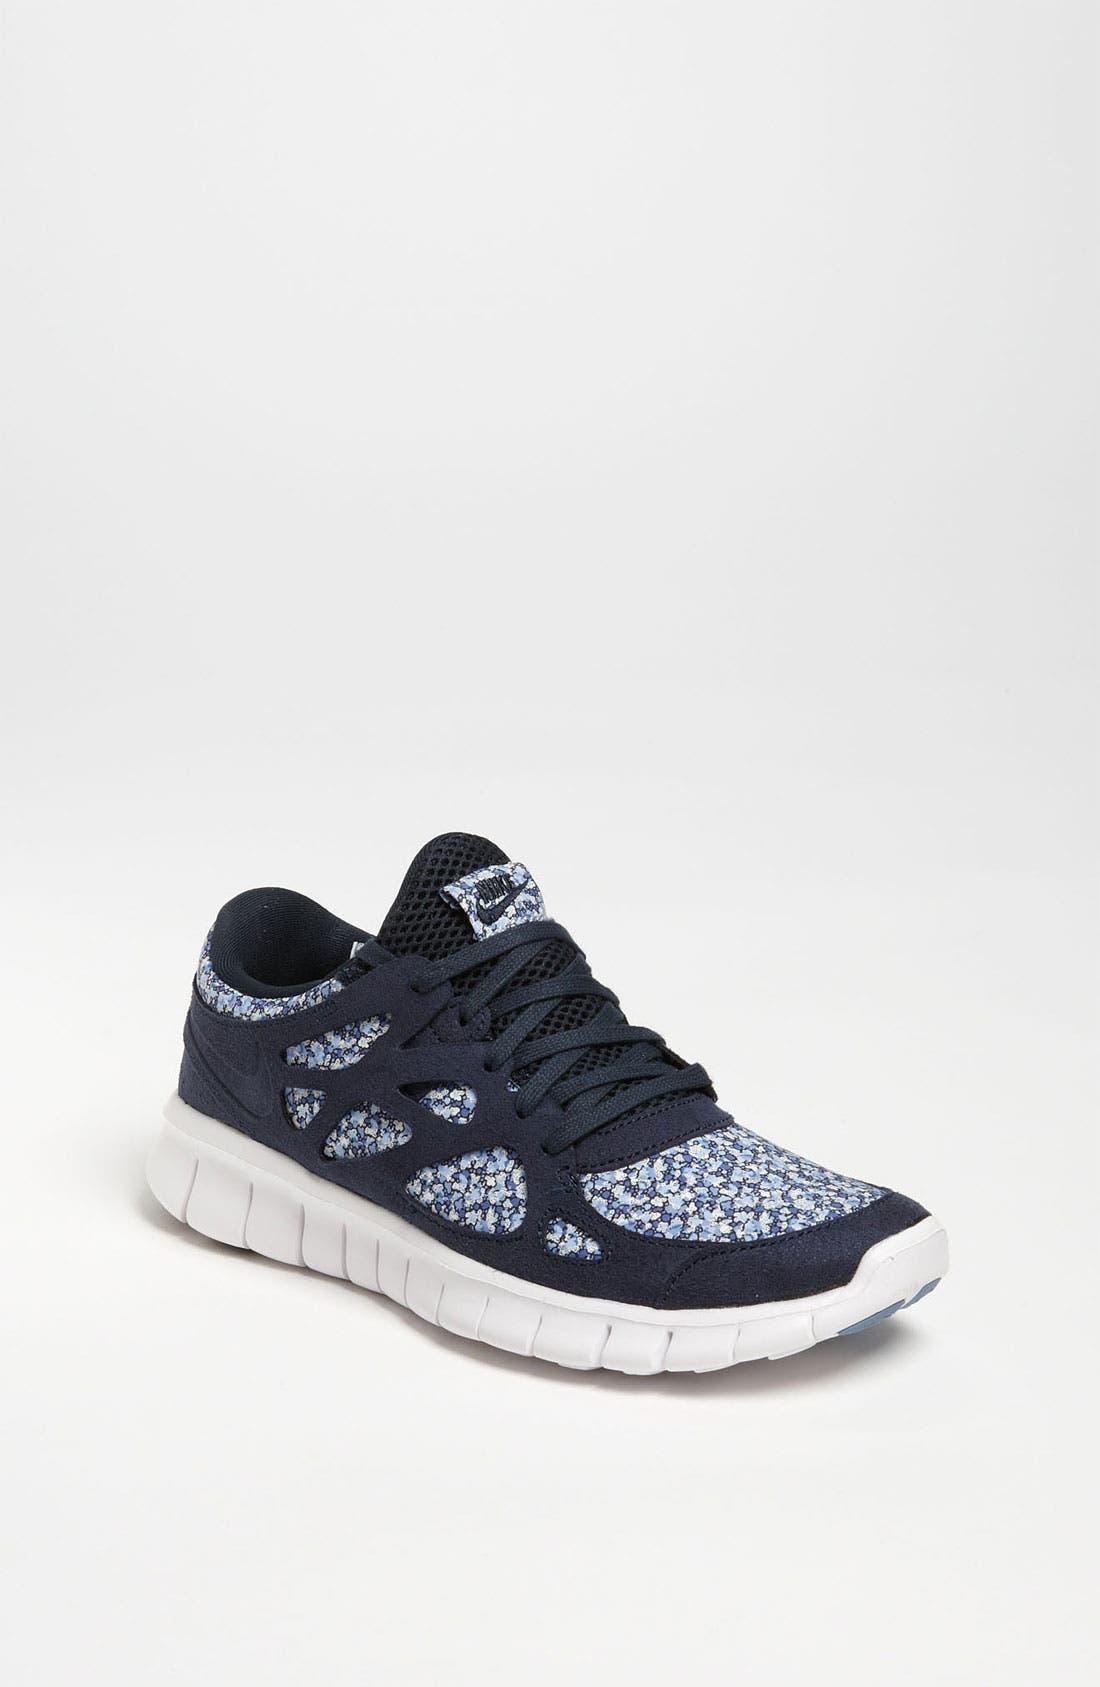 Alternate Image 1 Selected - Nike 'Free Run 2 Liberty' Sneaker (Women)